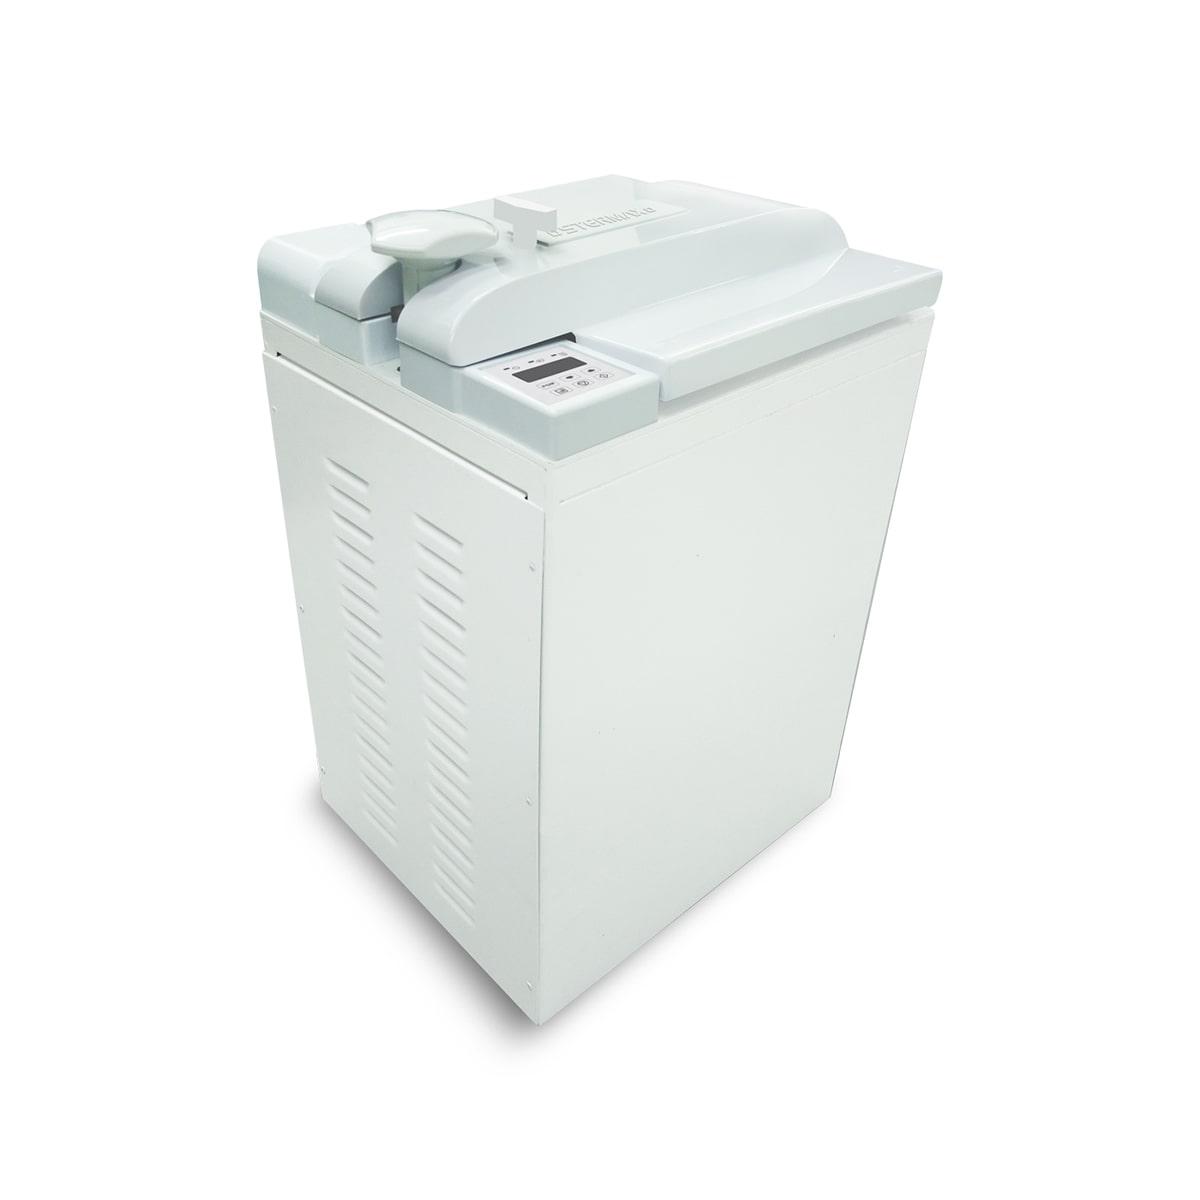 Autoclave Vertical Digital Gravitacional Normal Box 60 litros  Stermax